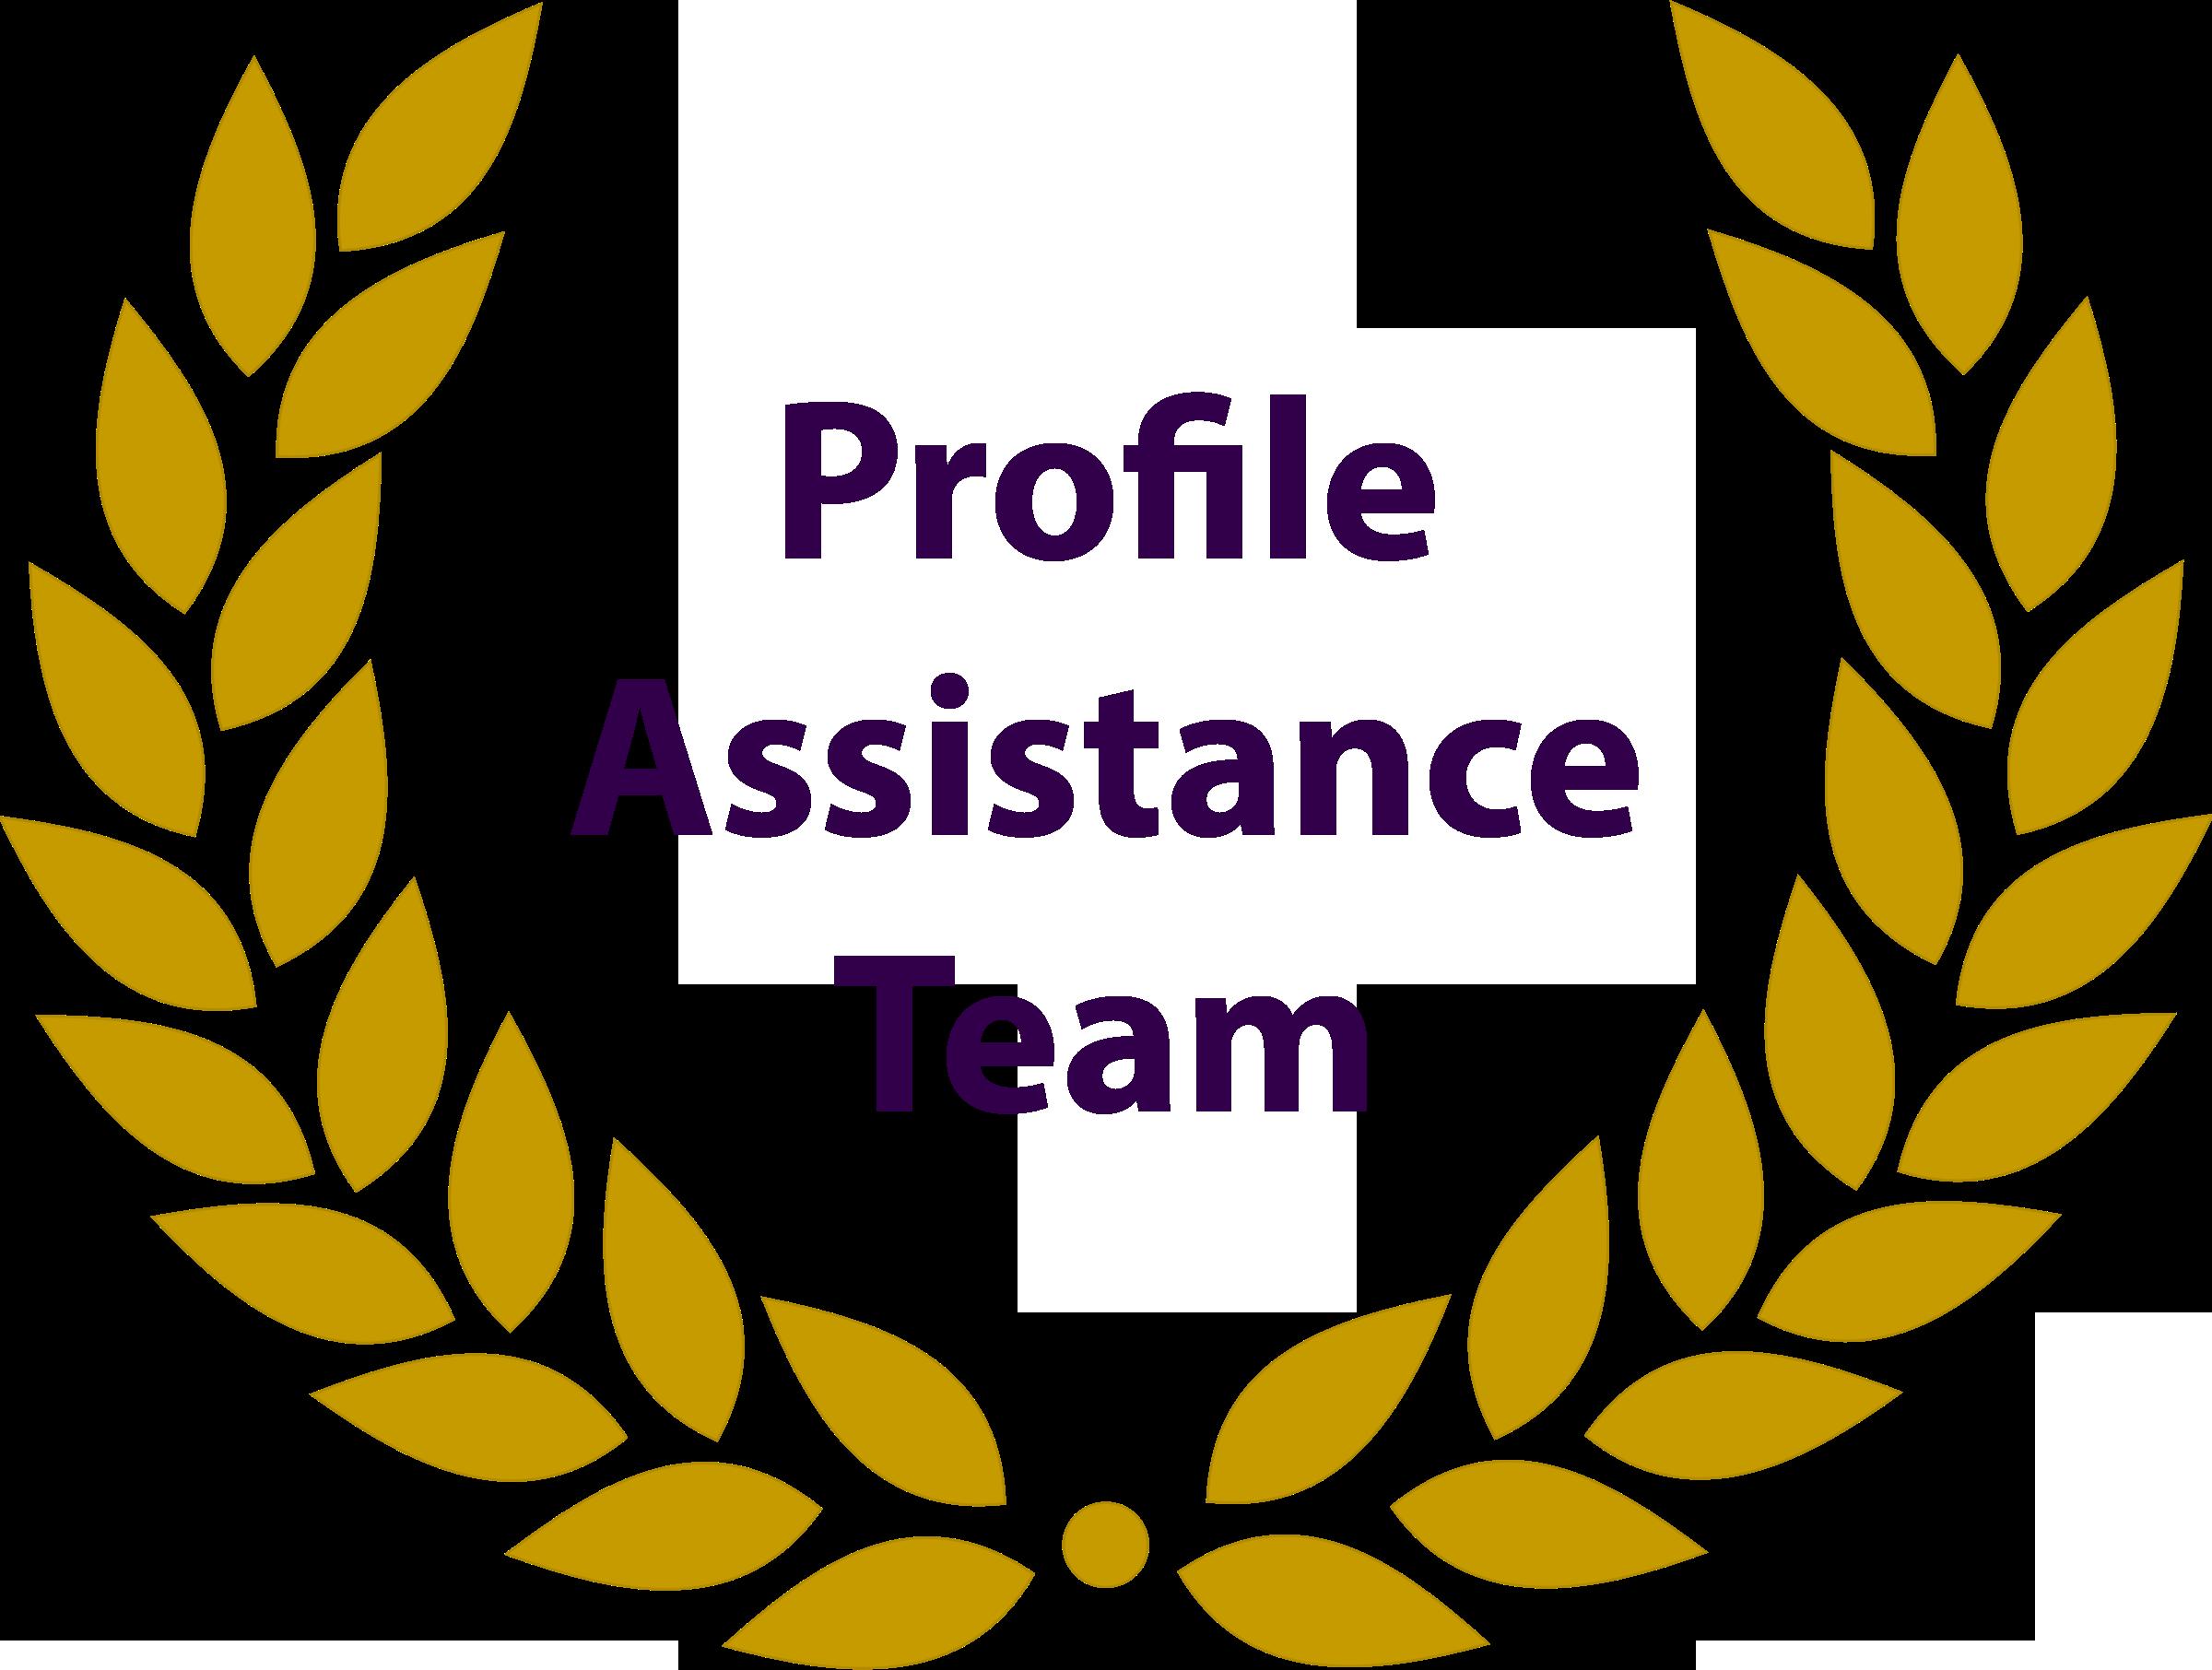 TWS Volunteer Profile Assistance Team (VPA)